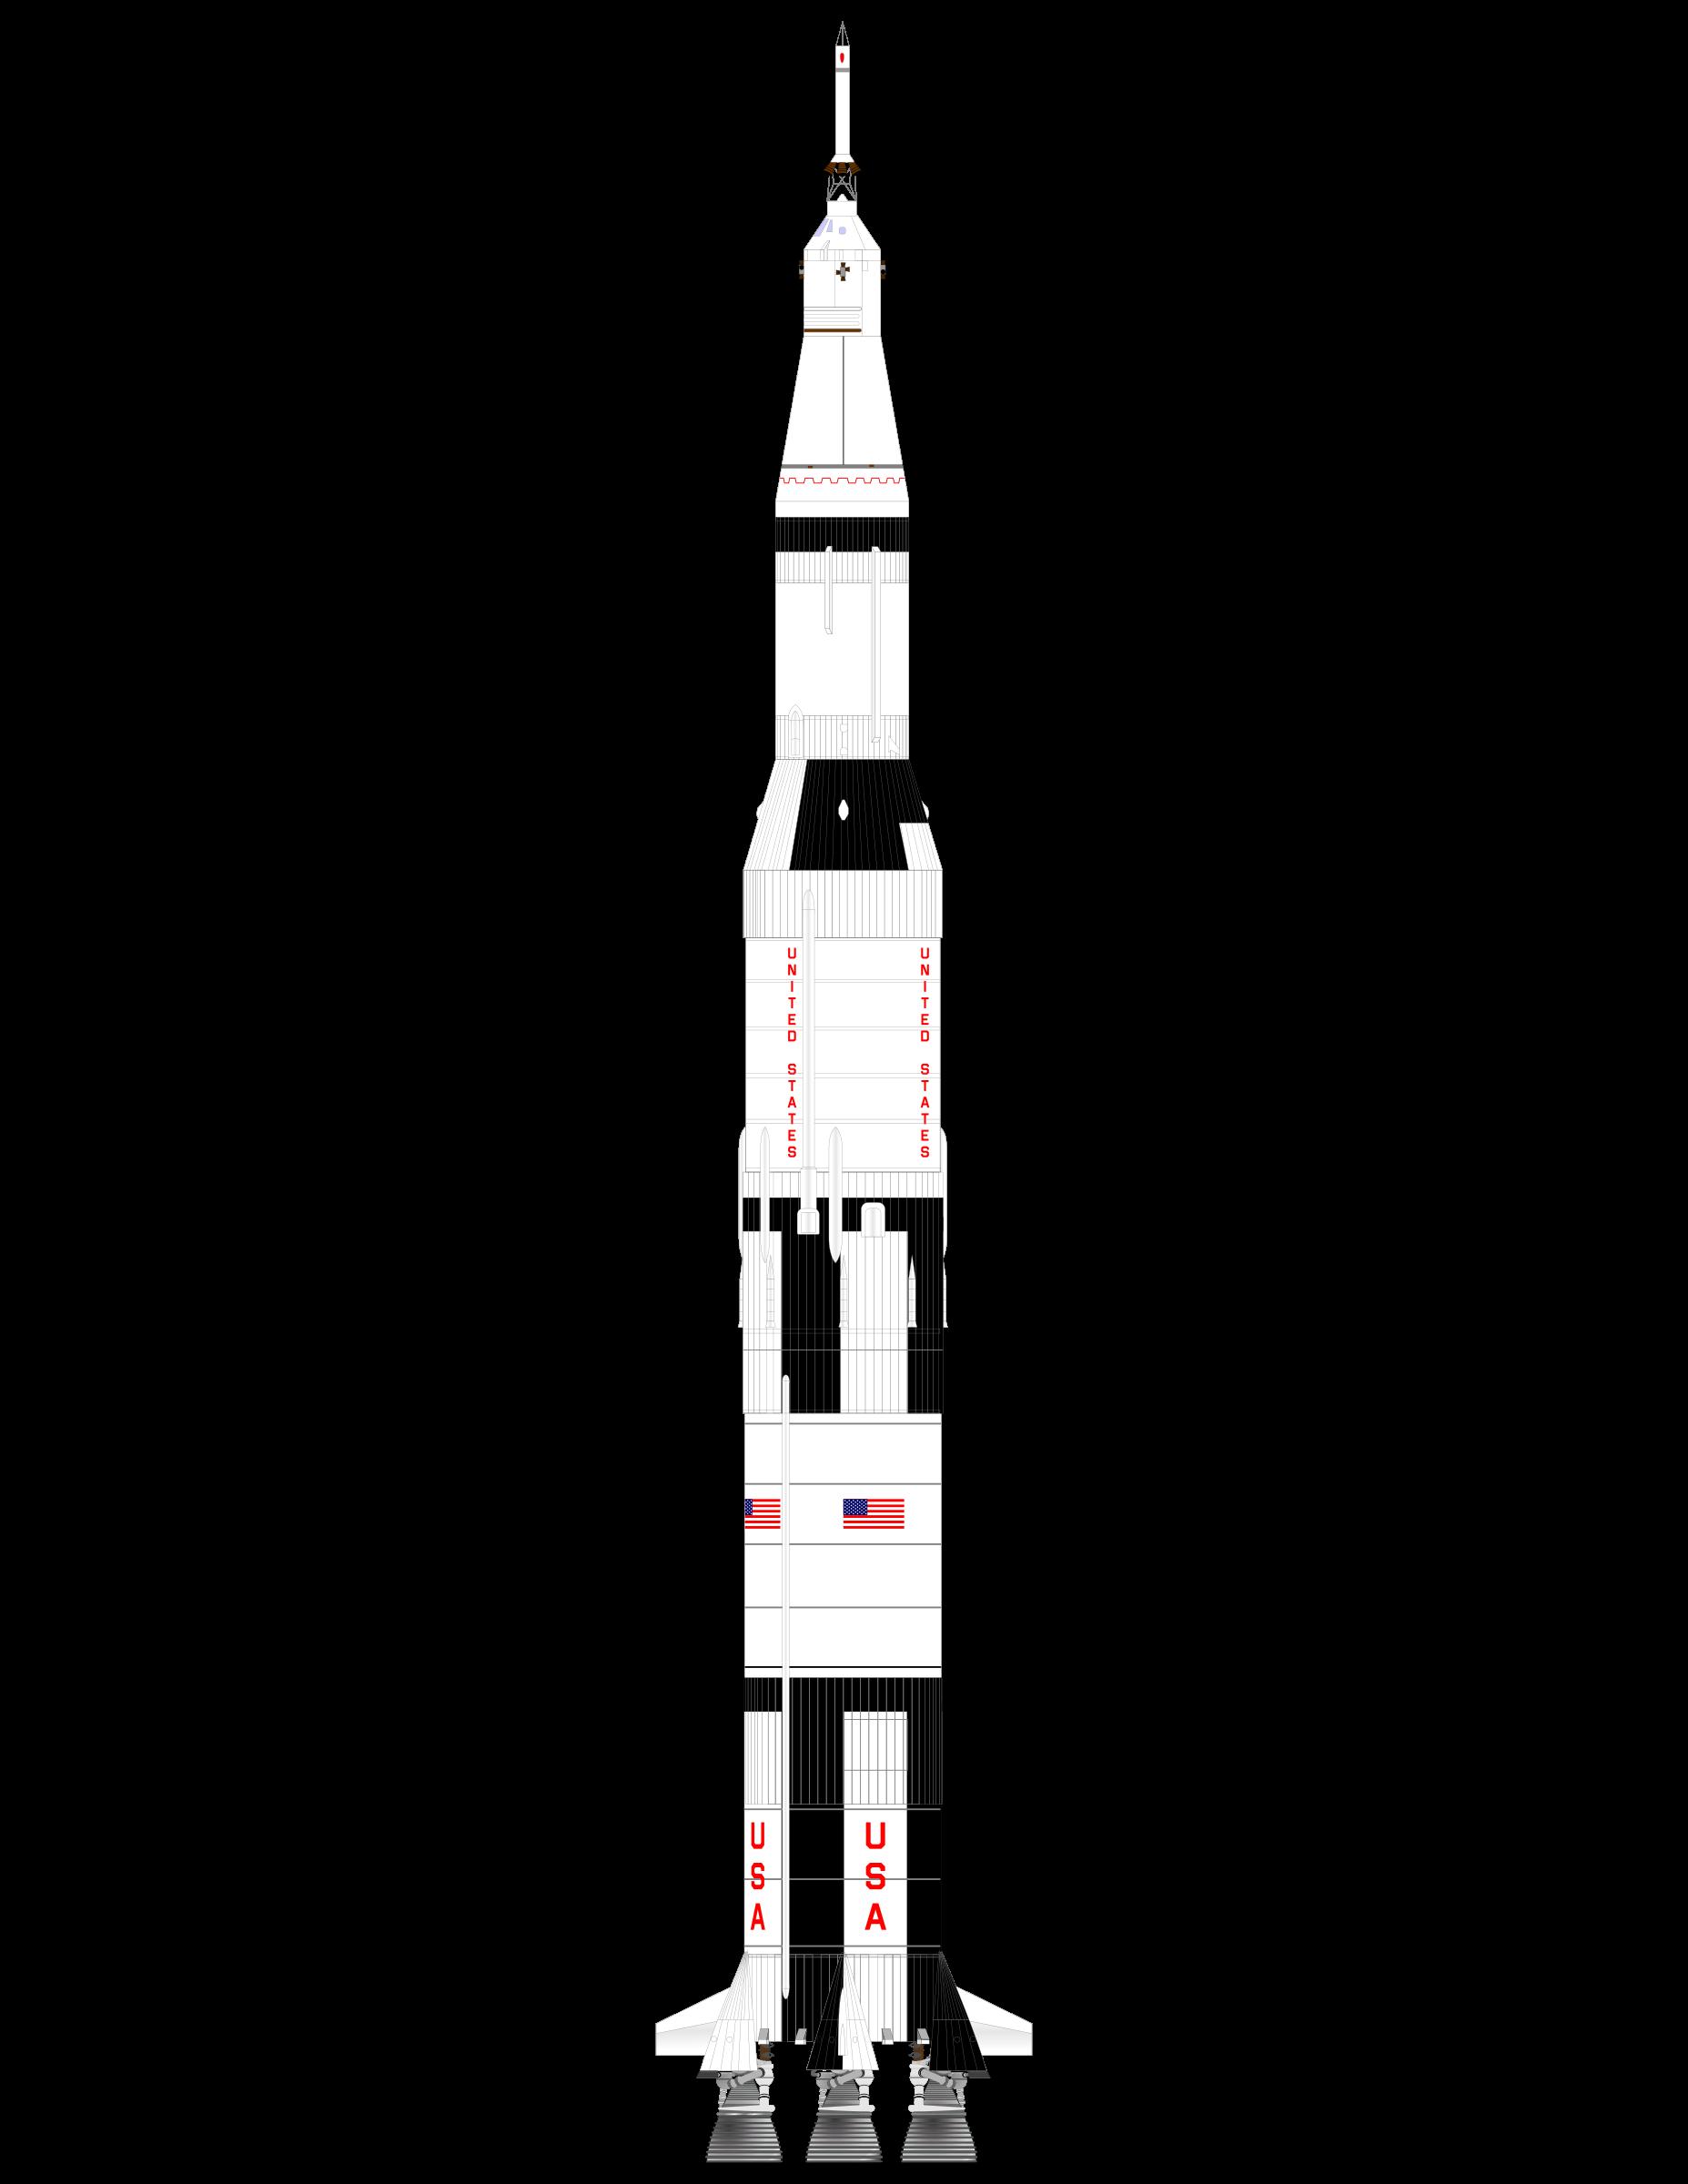 Clipart rocket vector. Saturn v by charner